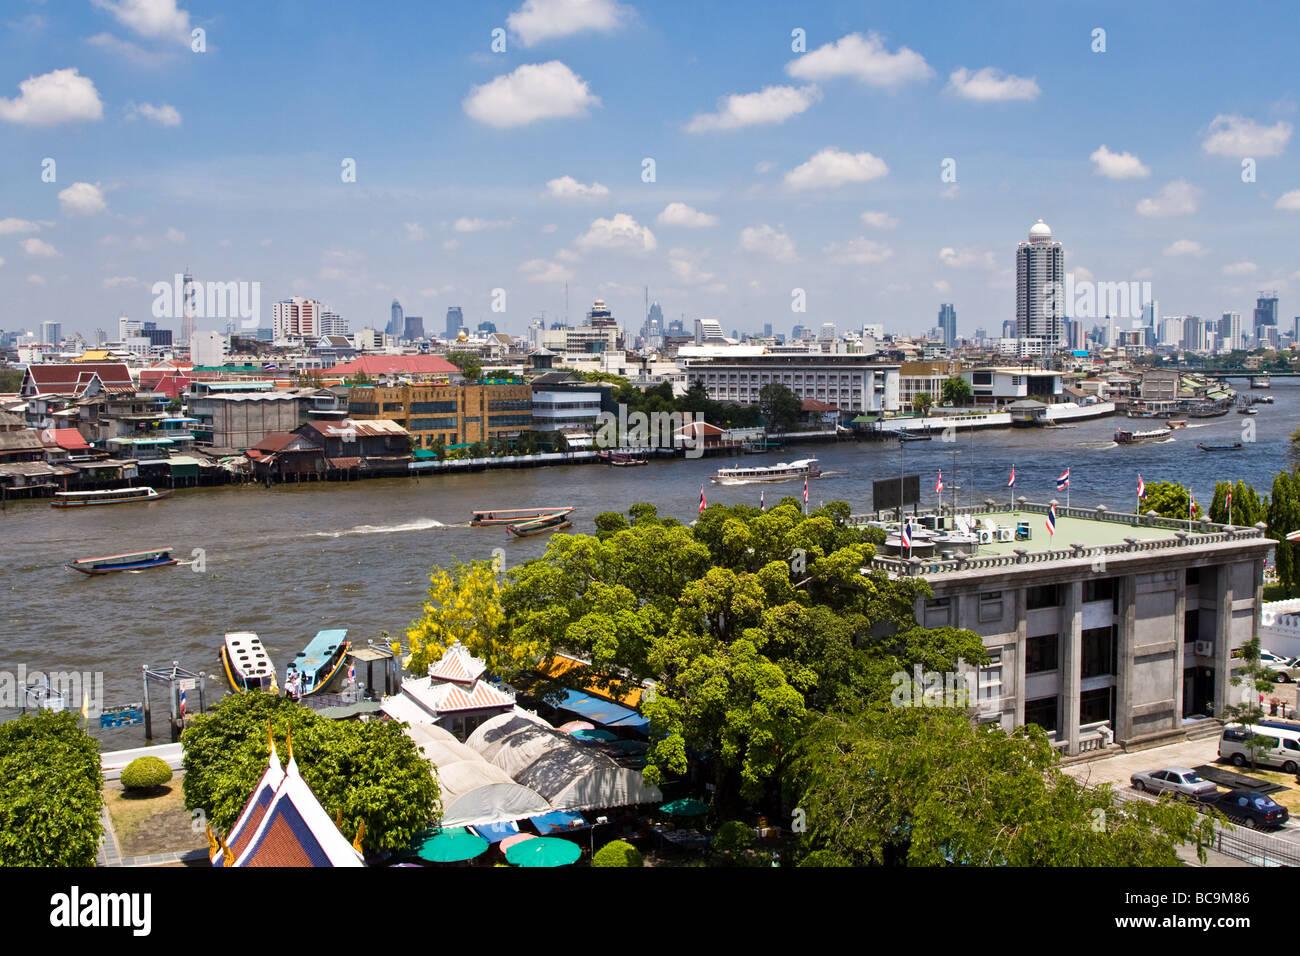 Panoramic view over the city centre of Bangkok, Thailand, along the Chao Praya river Stock Photo